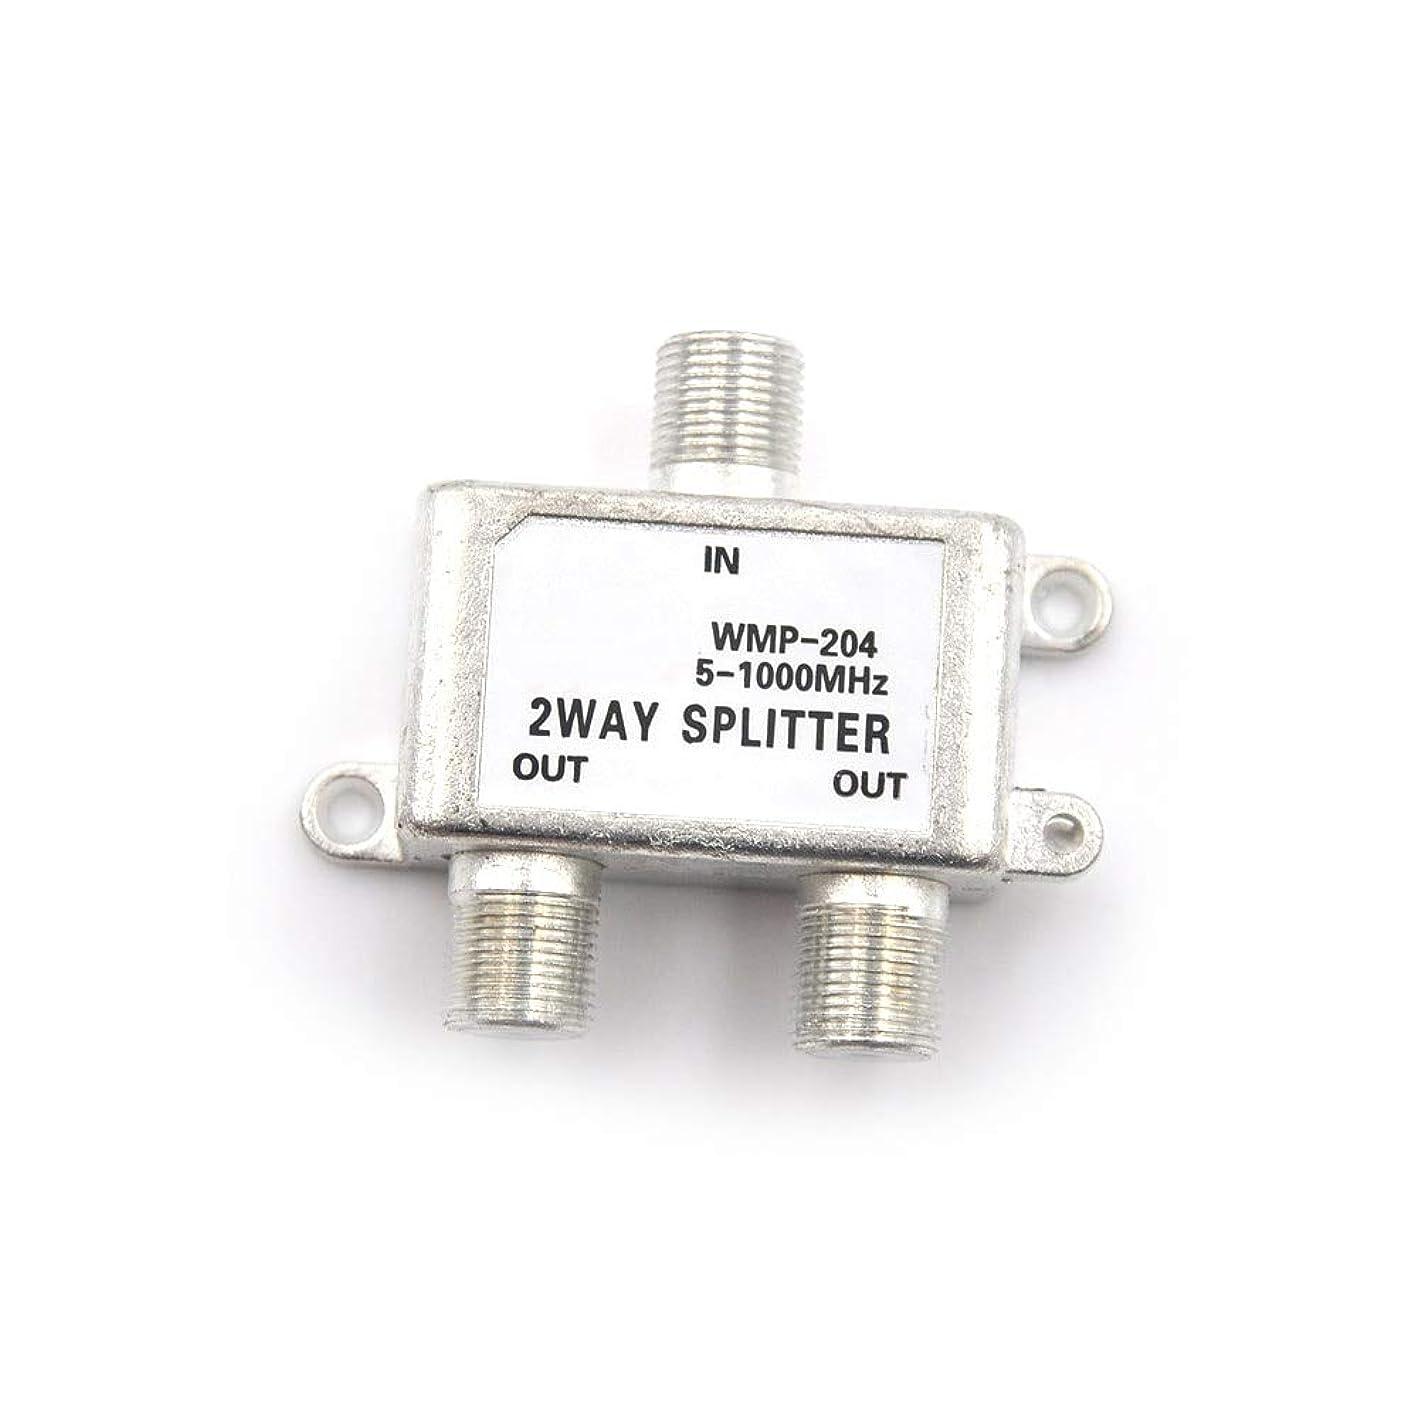 Gimax 2-Way MoCA 5-1000 MHz Connector Satellite TV Receiver Designed for SATV/CATV HD Digital Coax Cable Splitter Bi-Directional